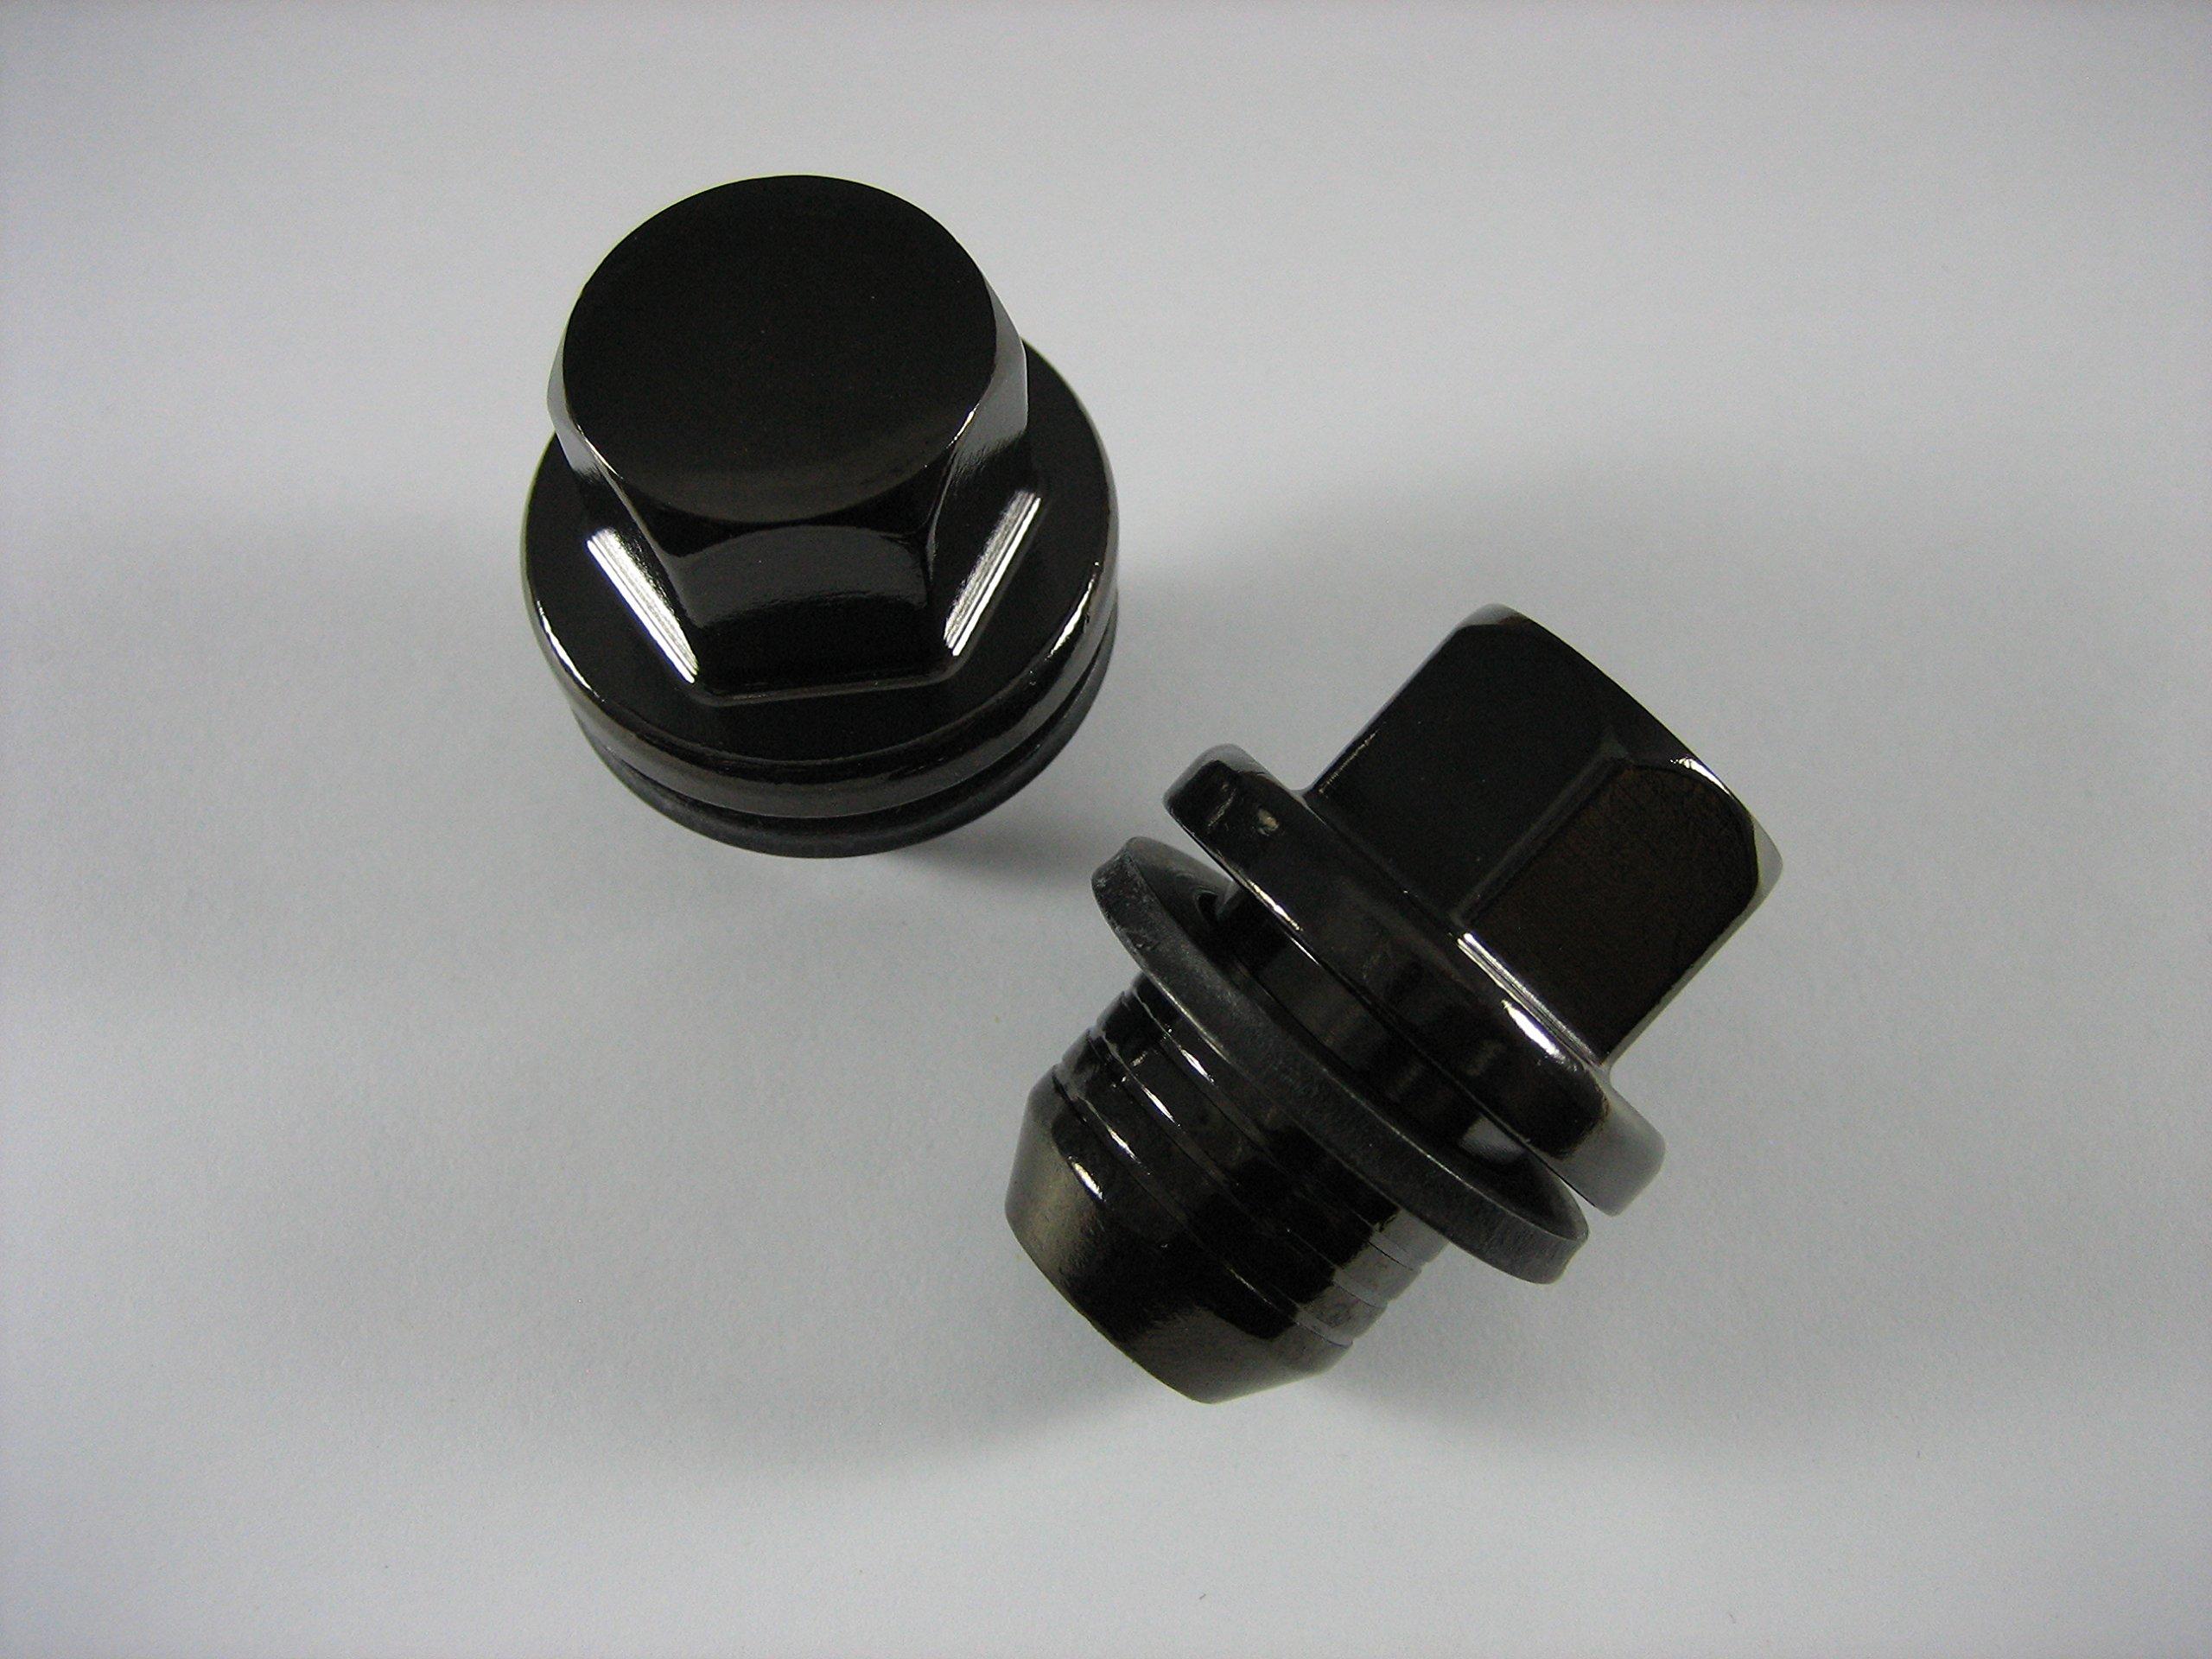 Genuine Land Rover Gloss Black Wheel Lug Nut Set for LR3 LR4 Range Rover and Sport